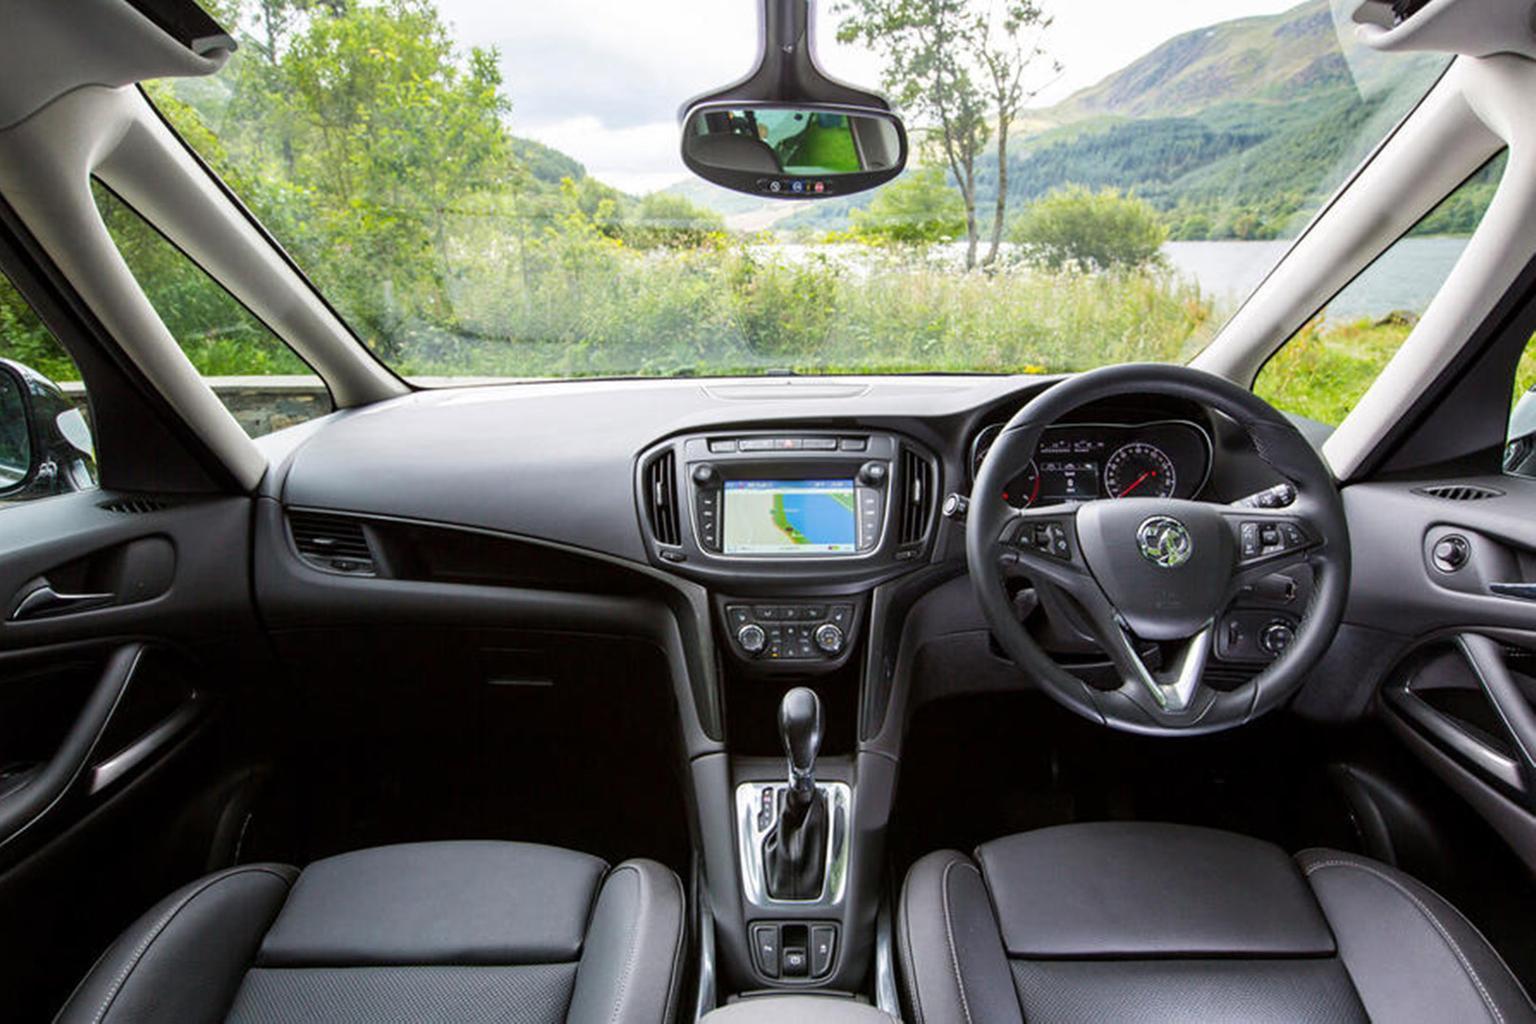 Vauxhall Zafira Tourer - interior